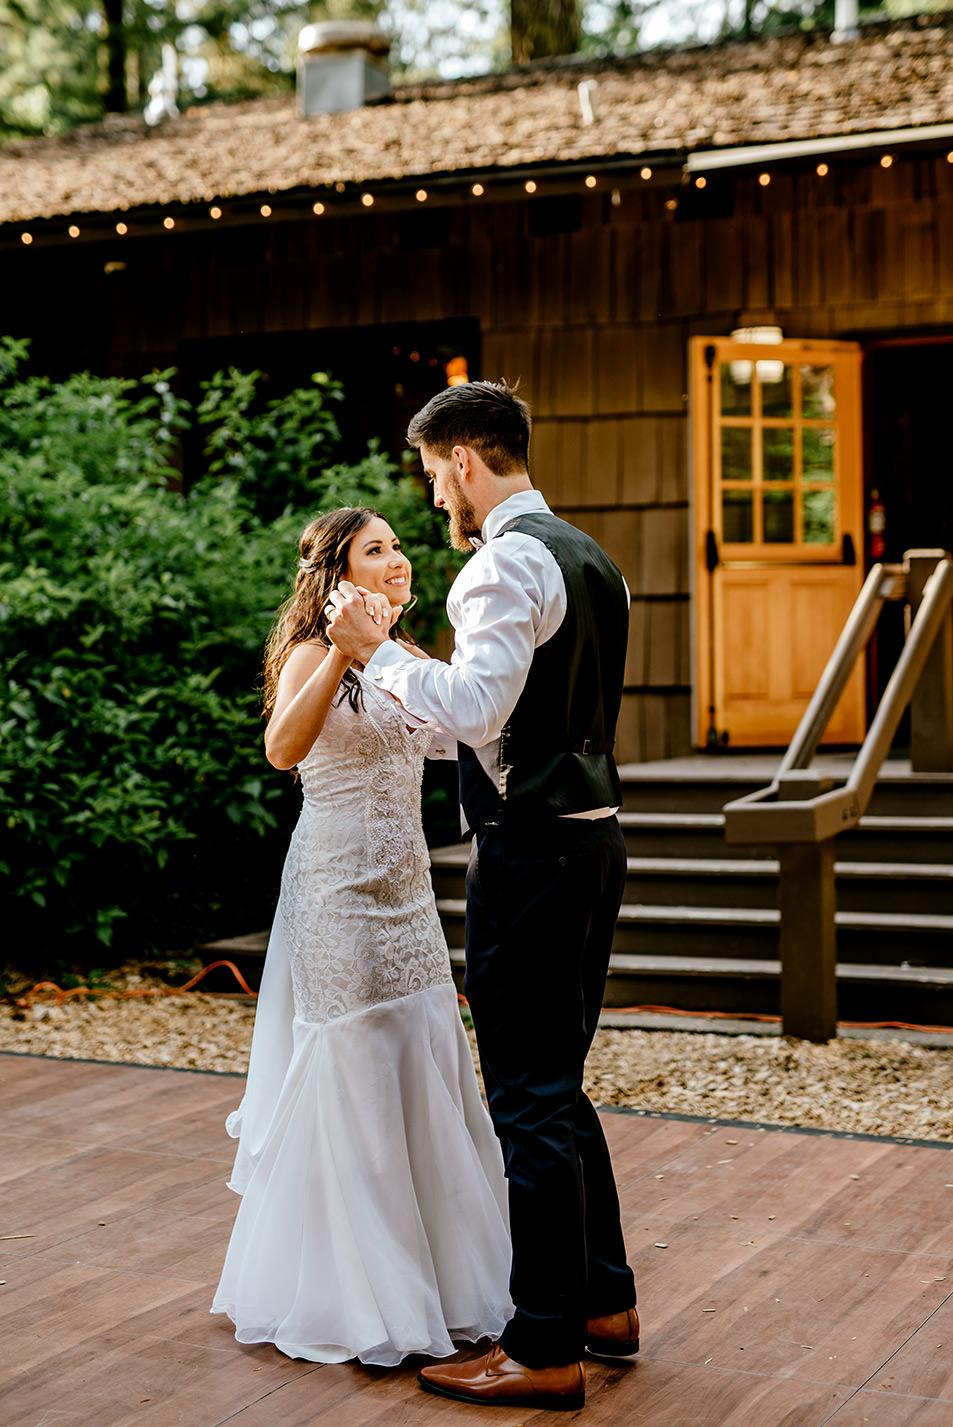 Silver-falls-state-park-wedding-85.jpg